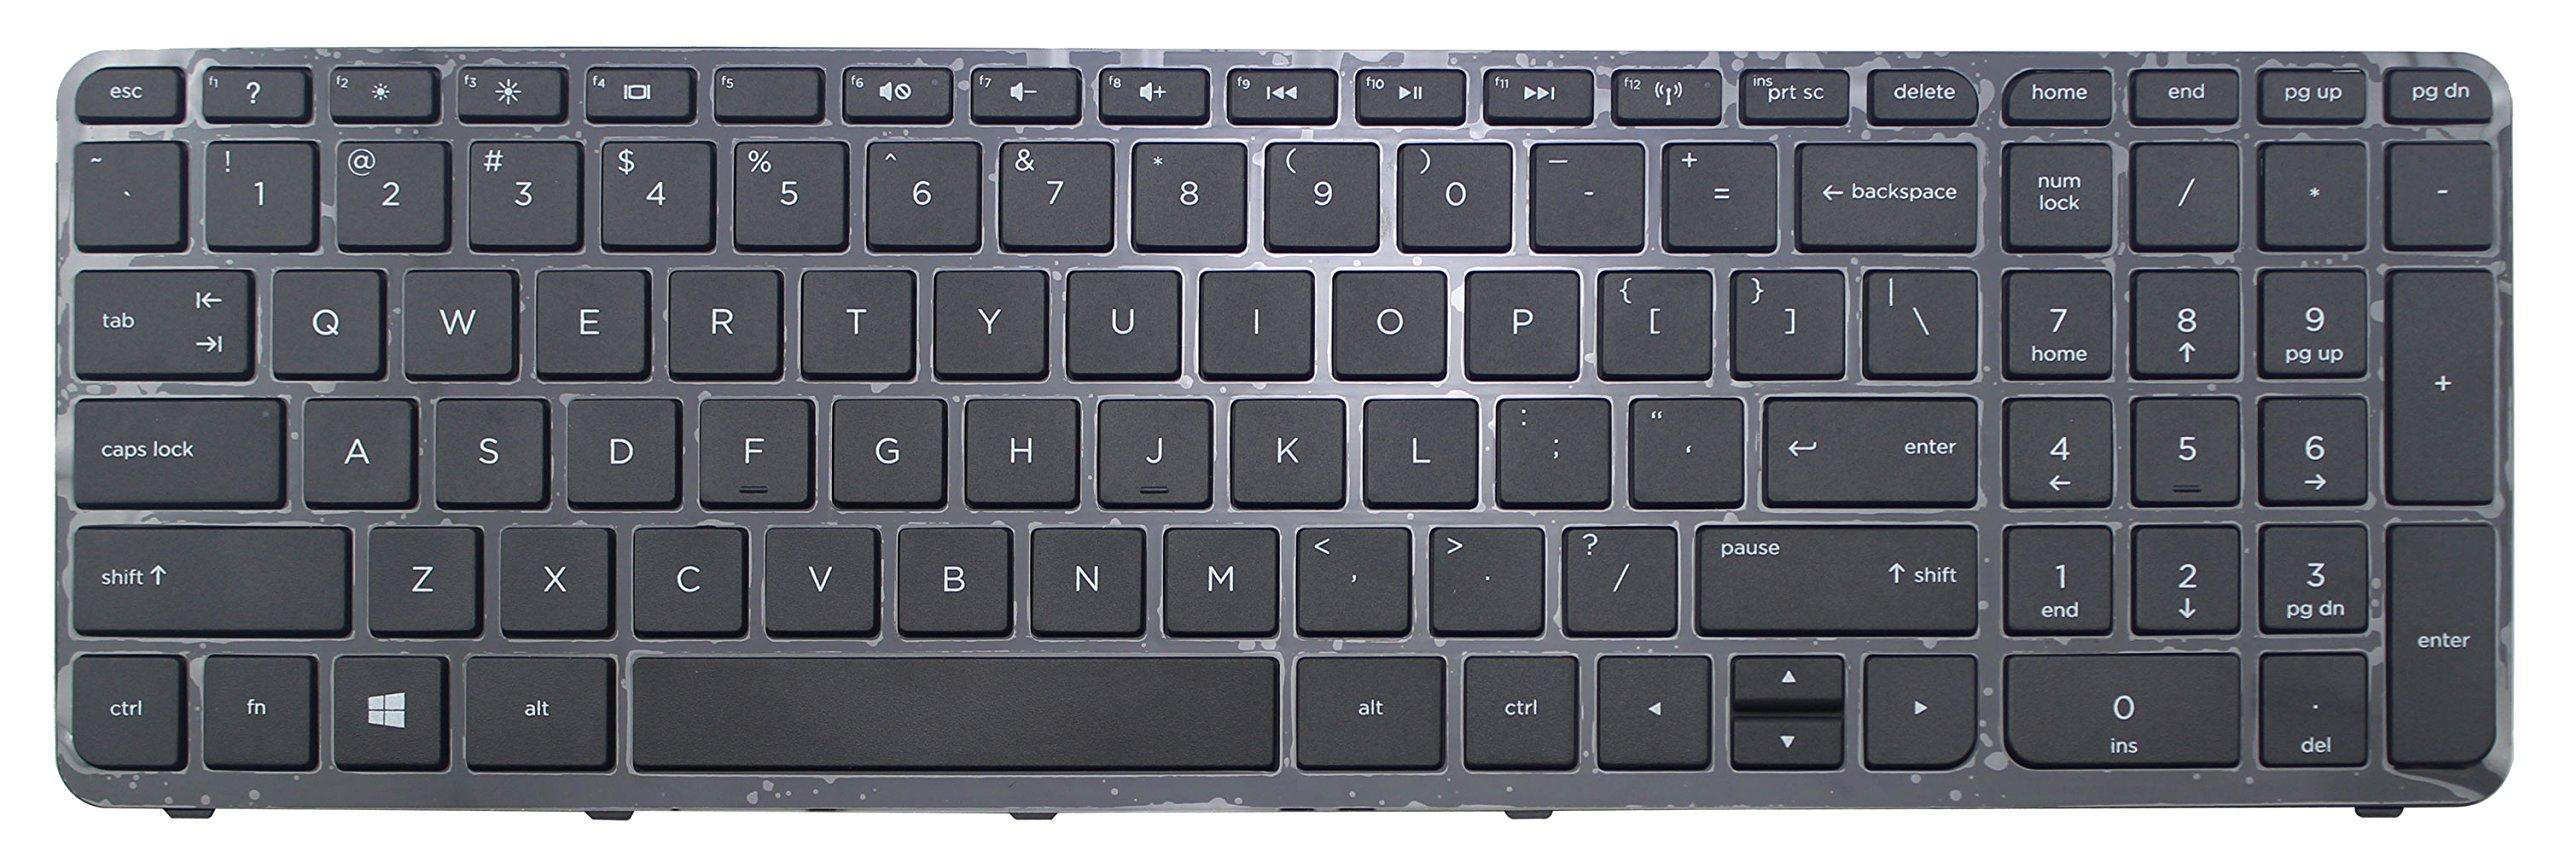 CHNASAWE Laptop US Layout Keyboard for HP Pavilion 17-e112nr 17-e113dx 17-e113nr 17-e117dx 17-e117nr